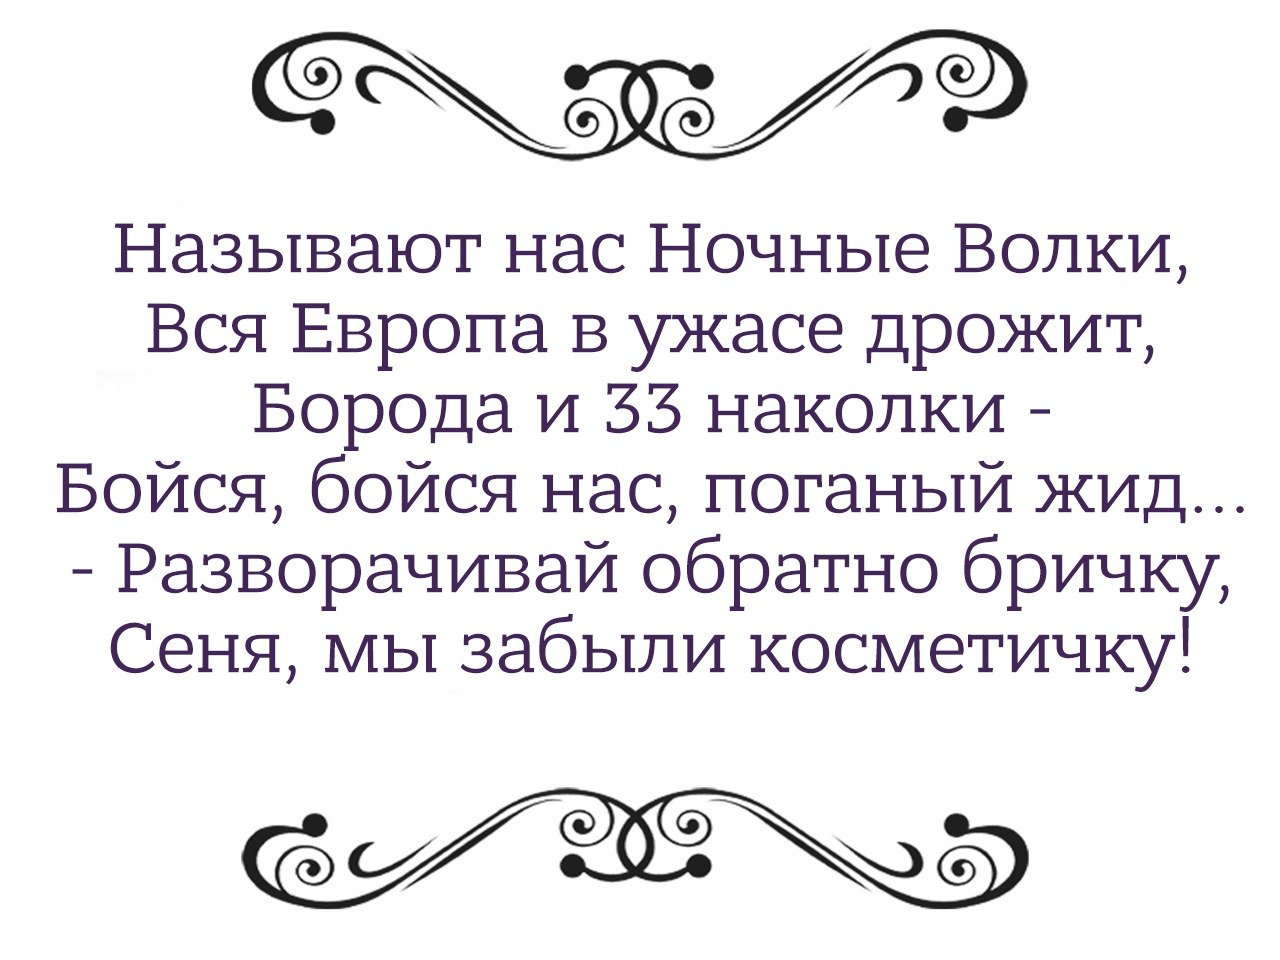 https://pp.vk.me/c543106/v543106563/43c8/miG4m2ilBGg.jpg